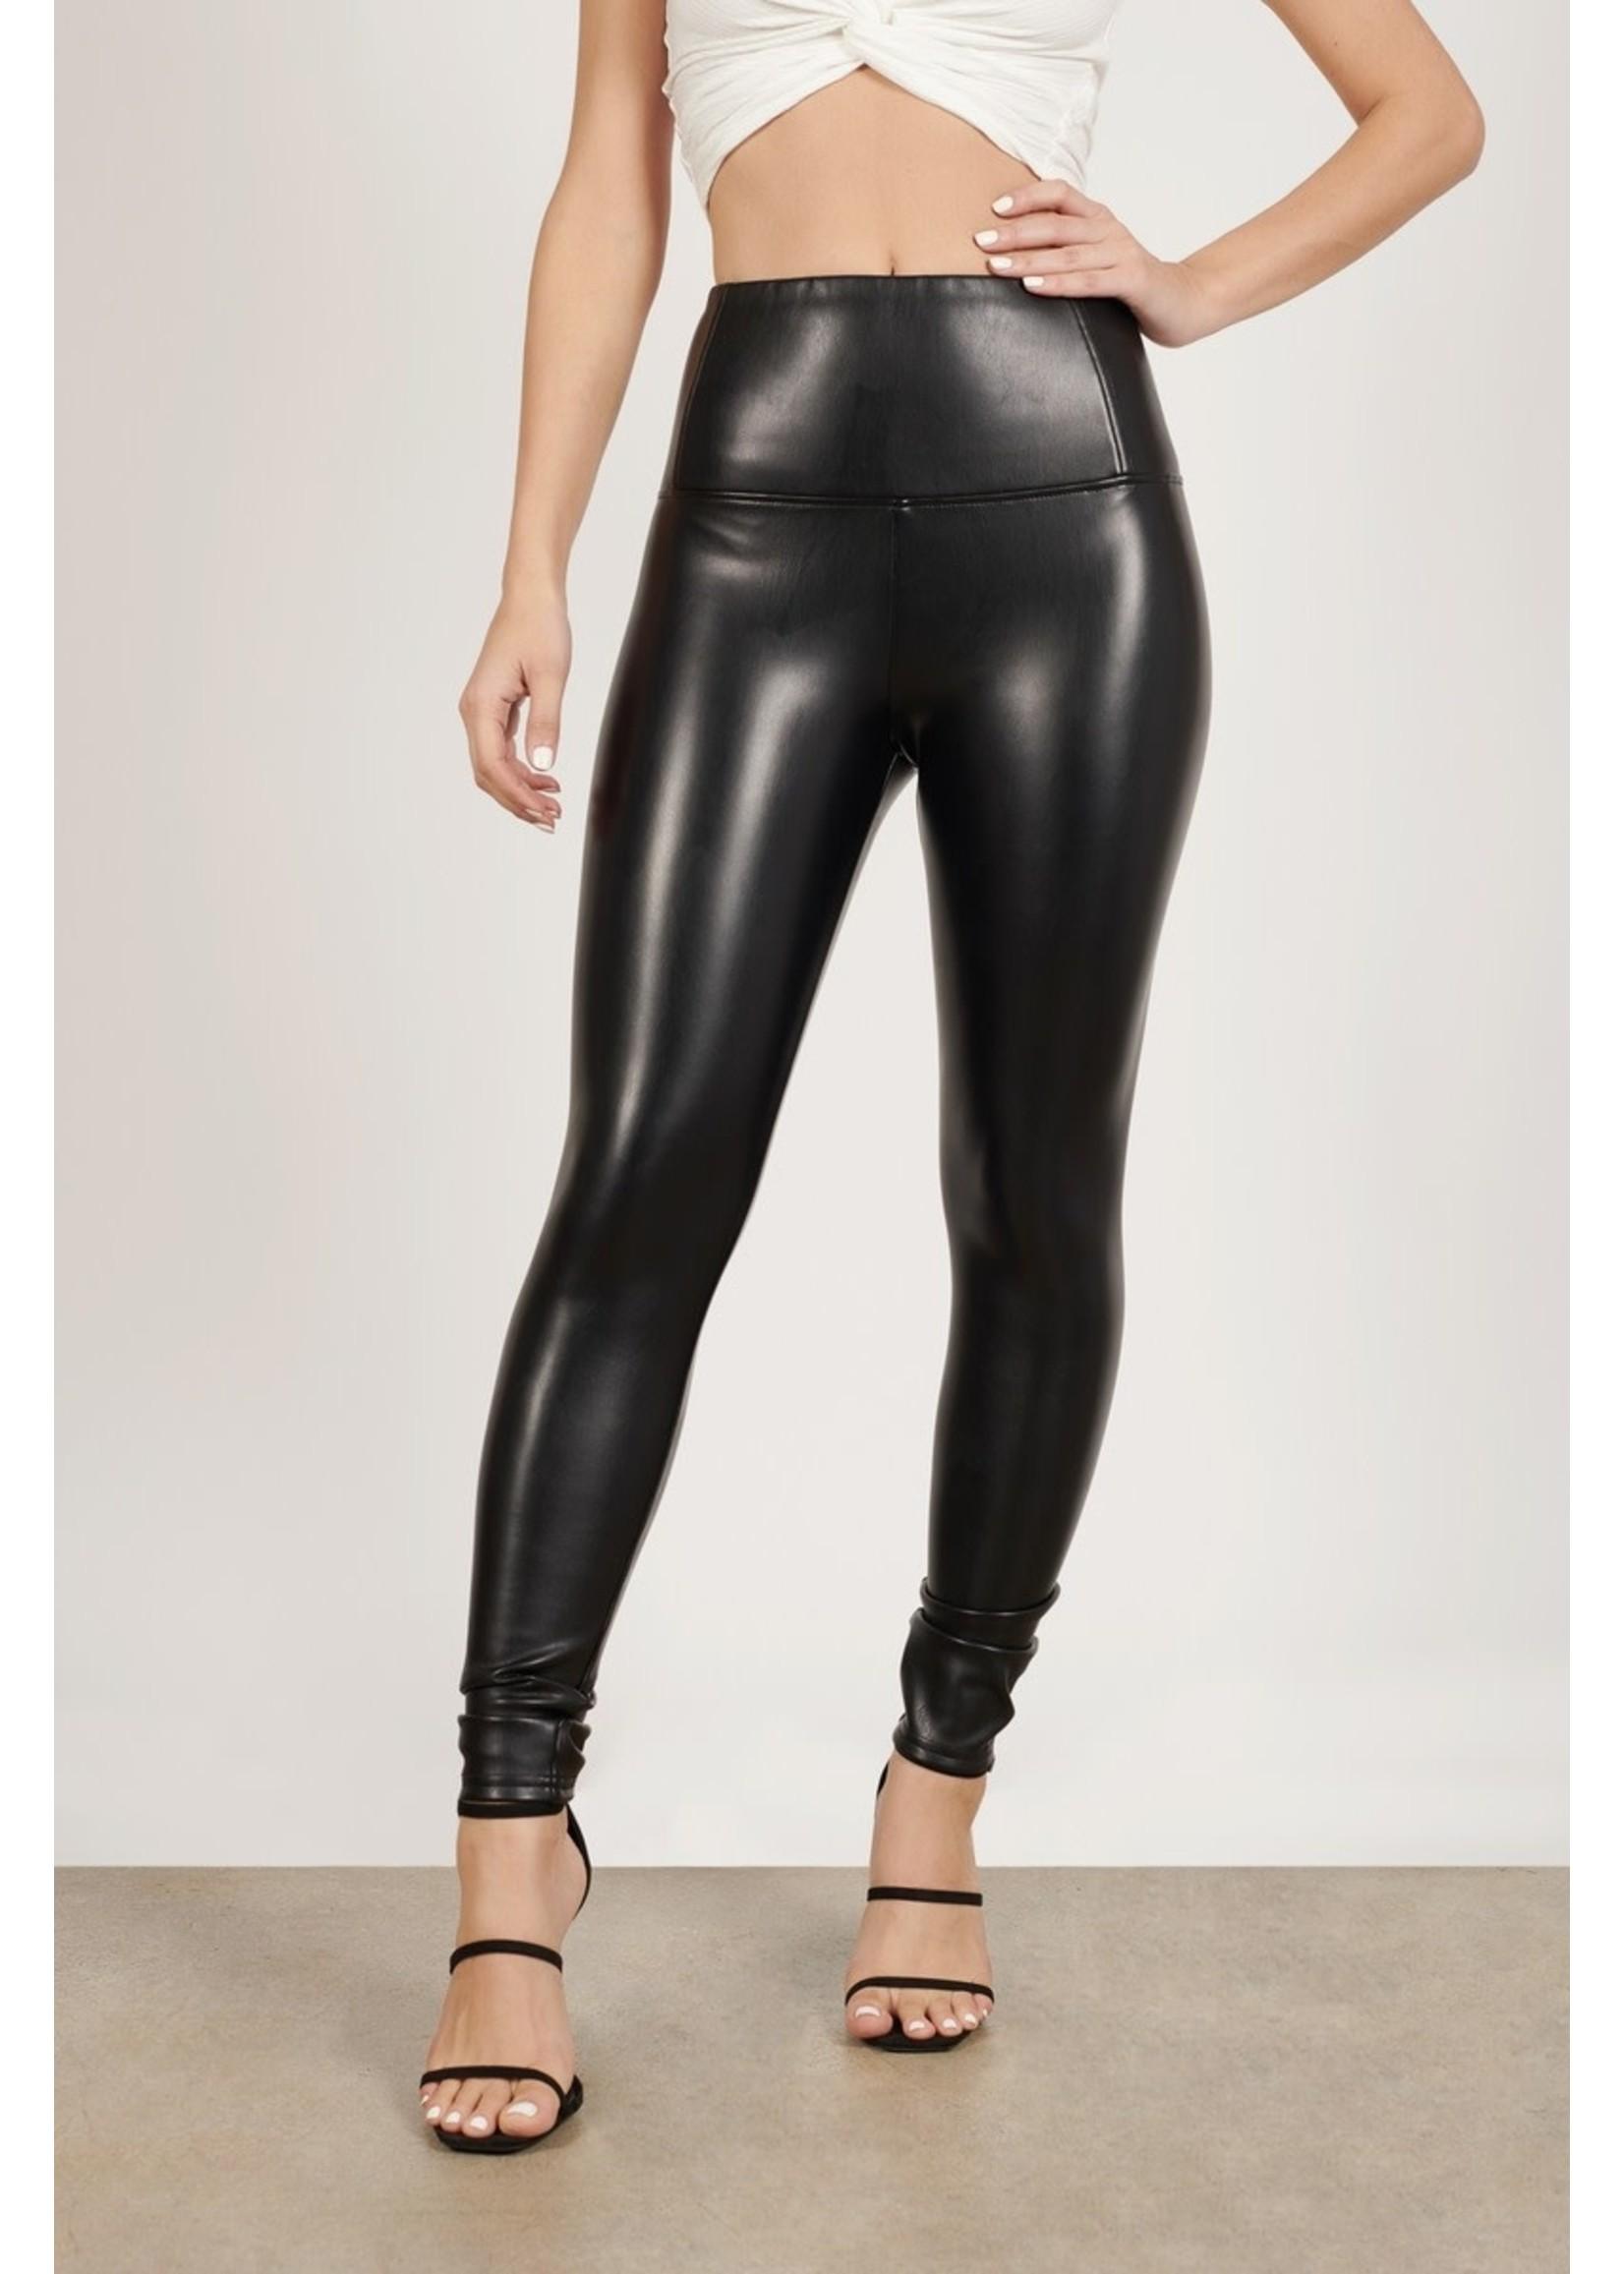 Faux Leather High Waist Skinny Leggings (Black)